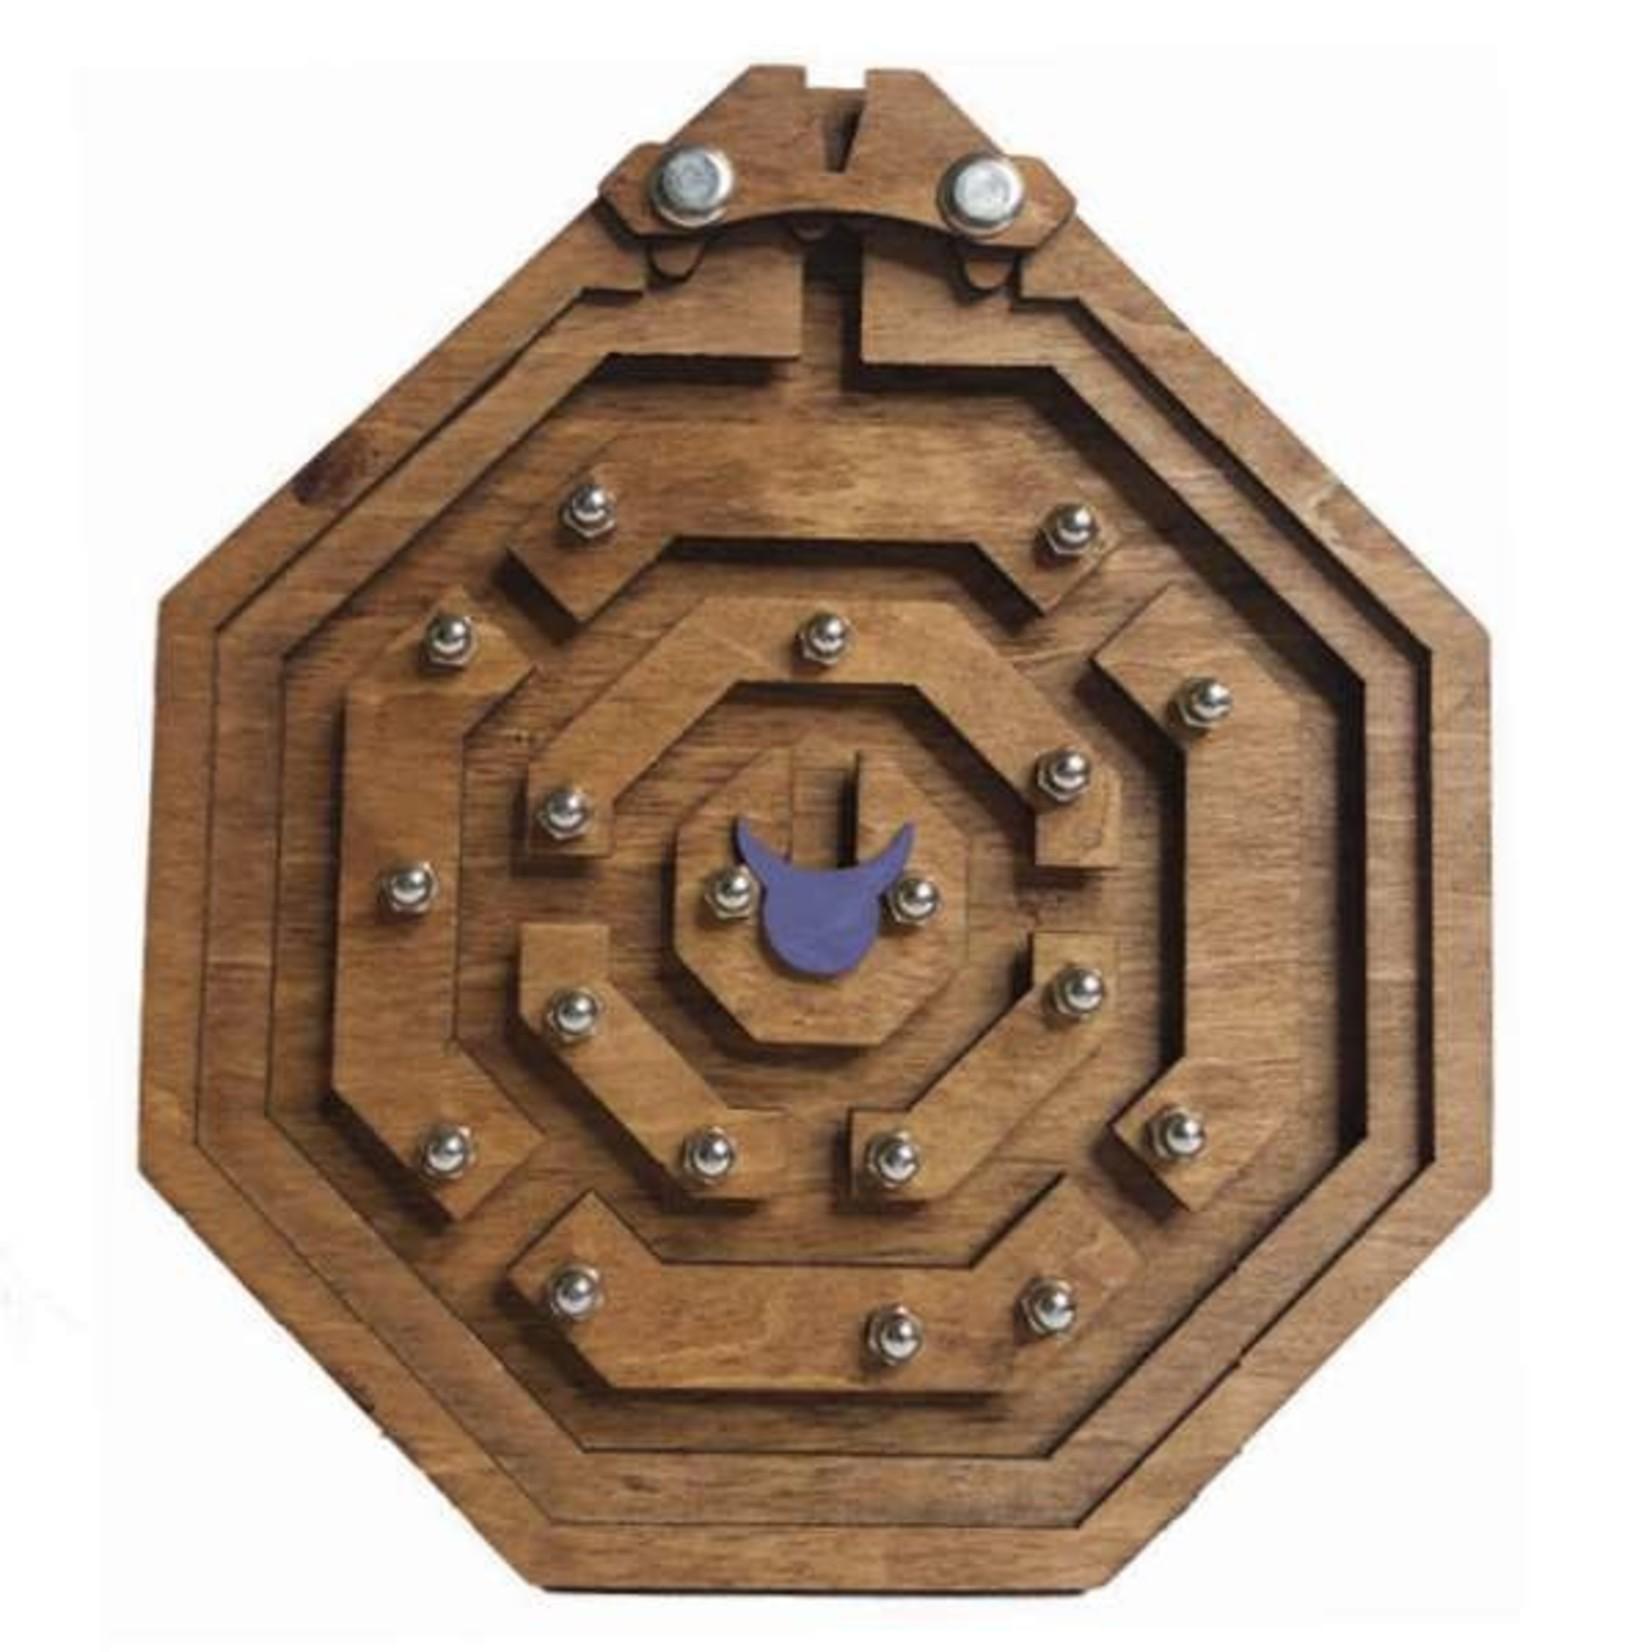 Project Genius True Genius: Minotaur's Labyrinth